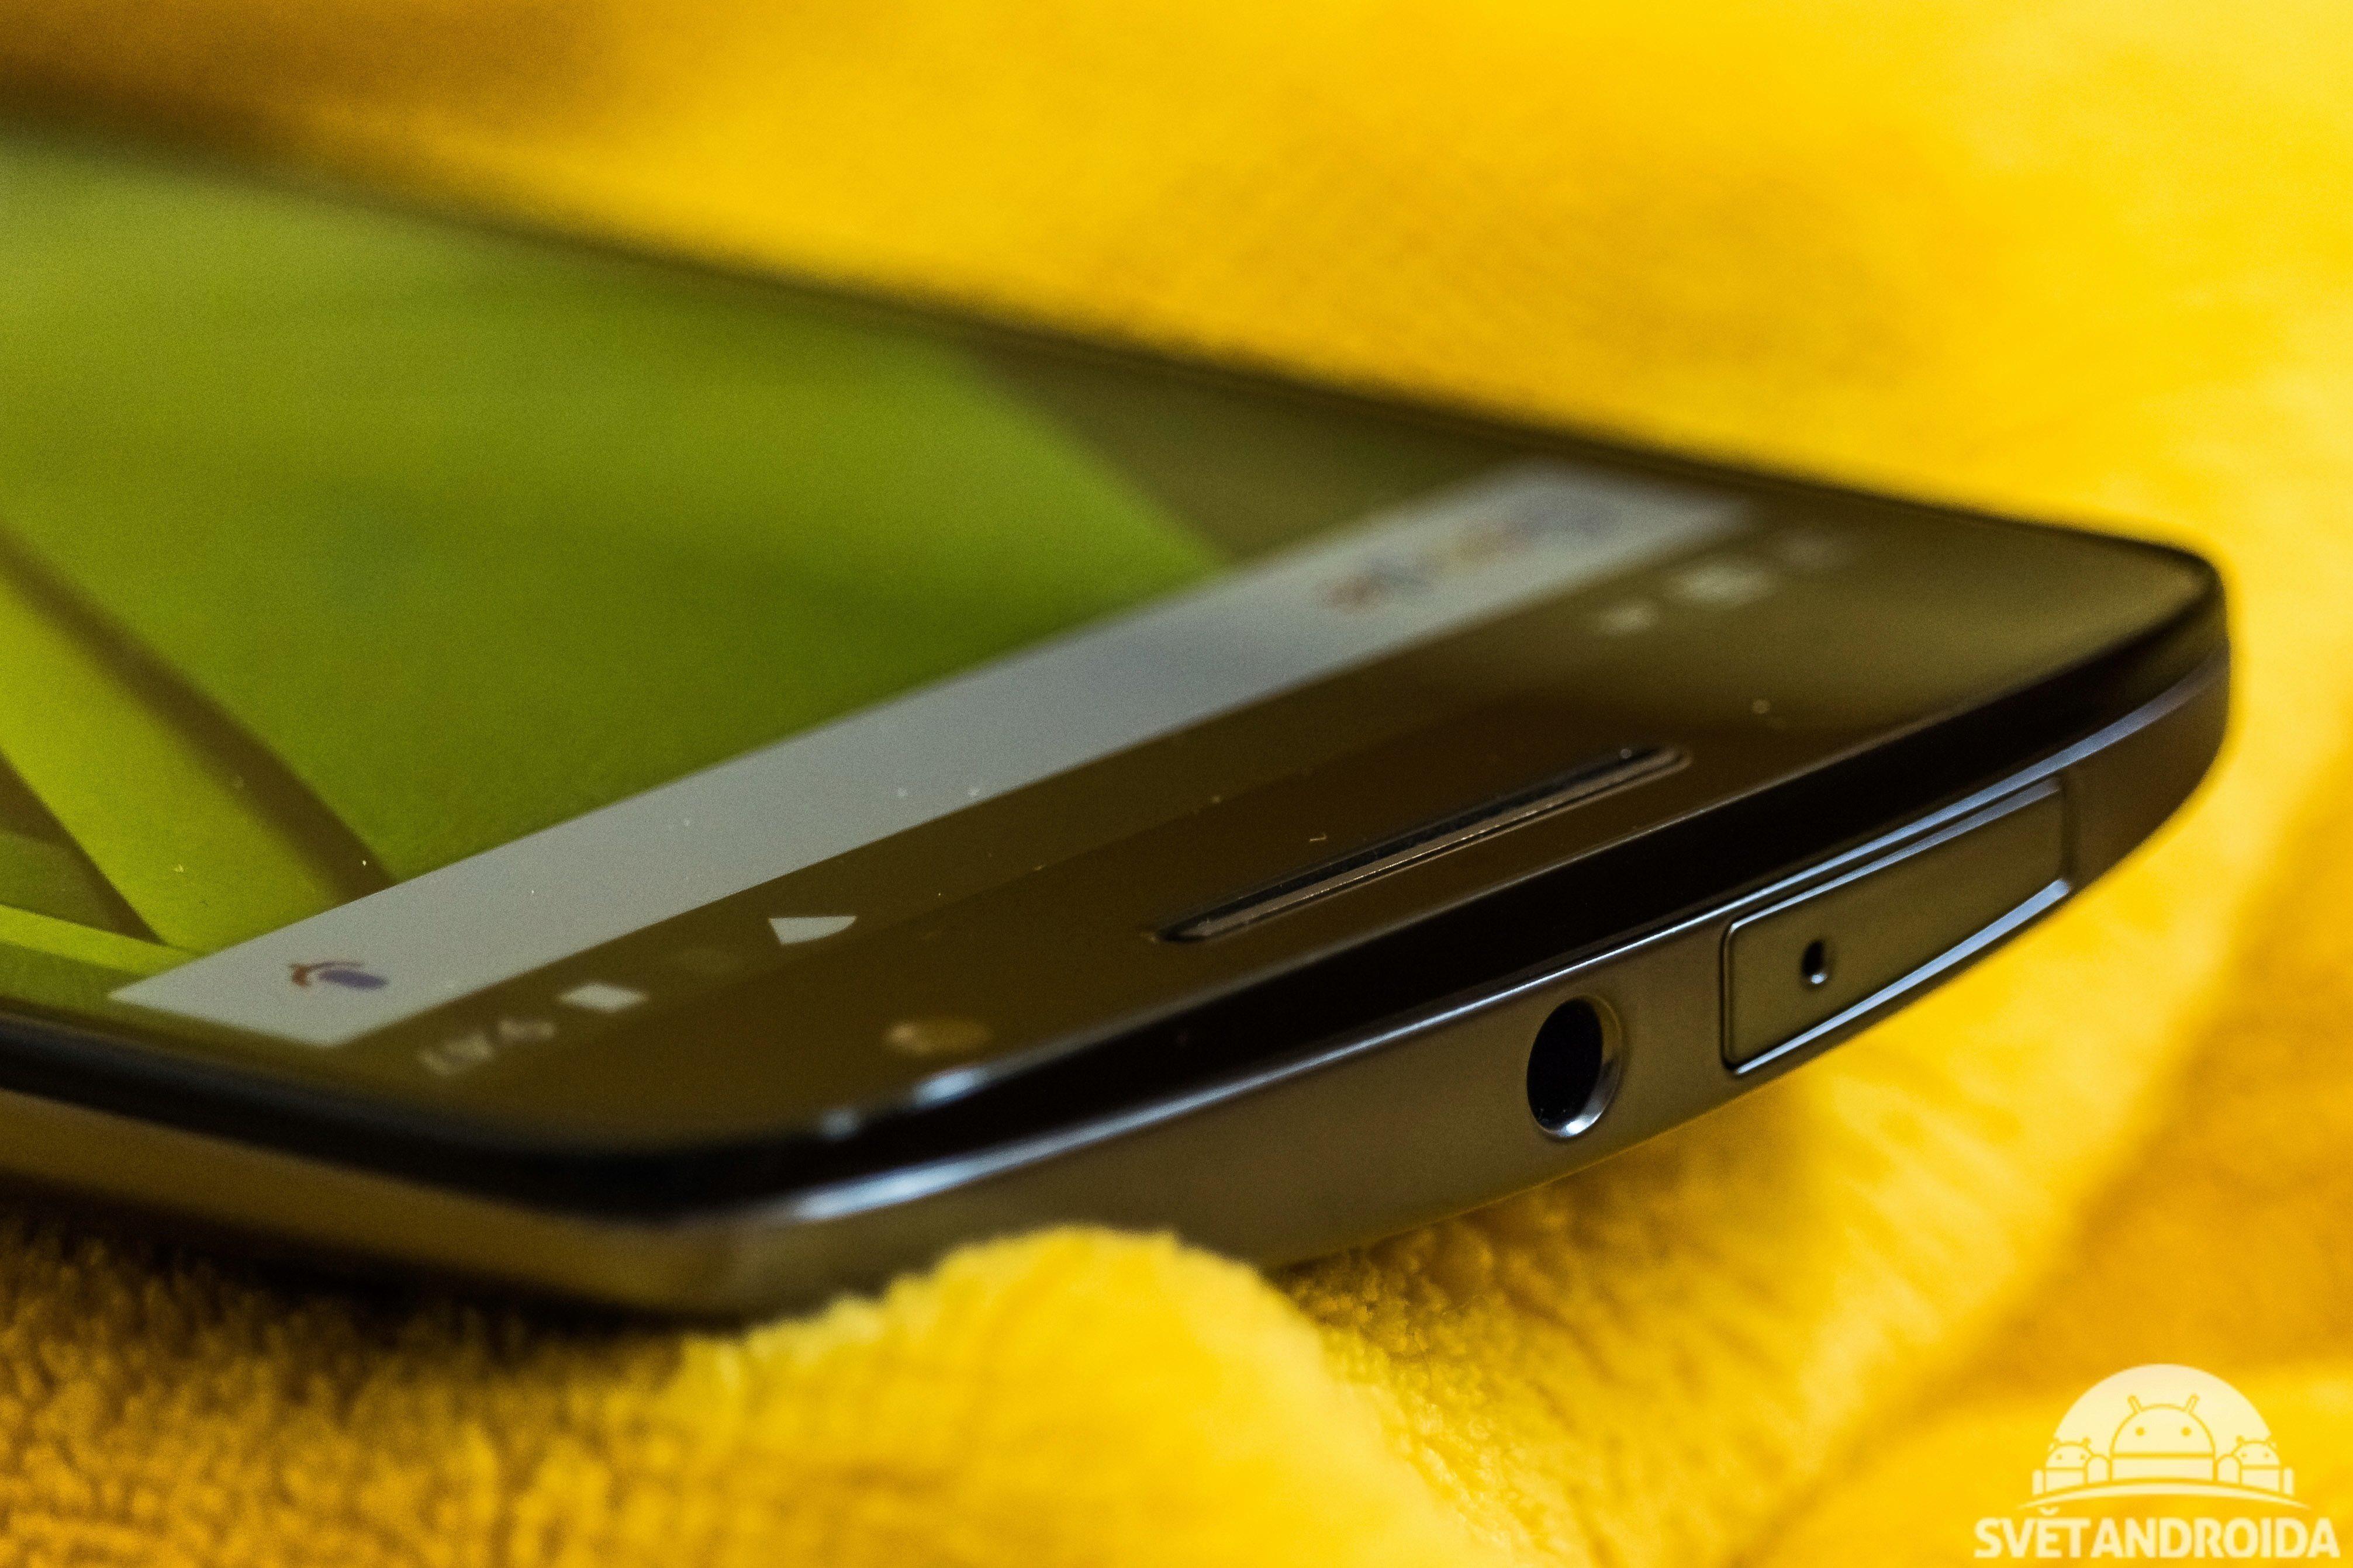 Moto X Play - horní strana